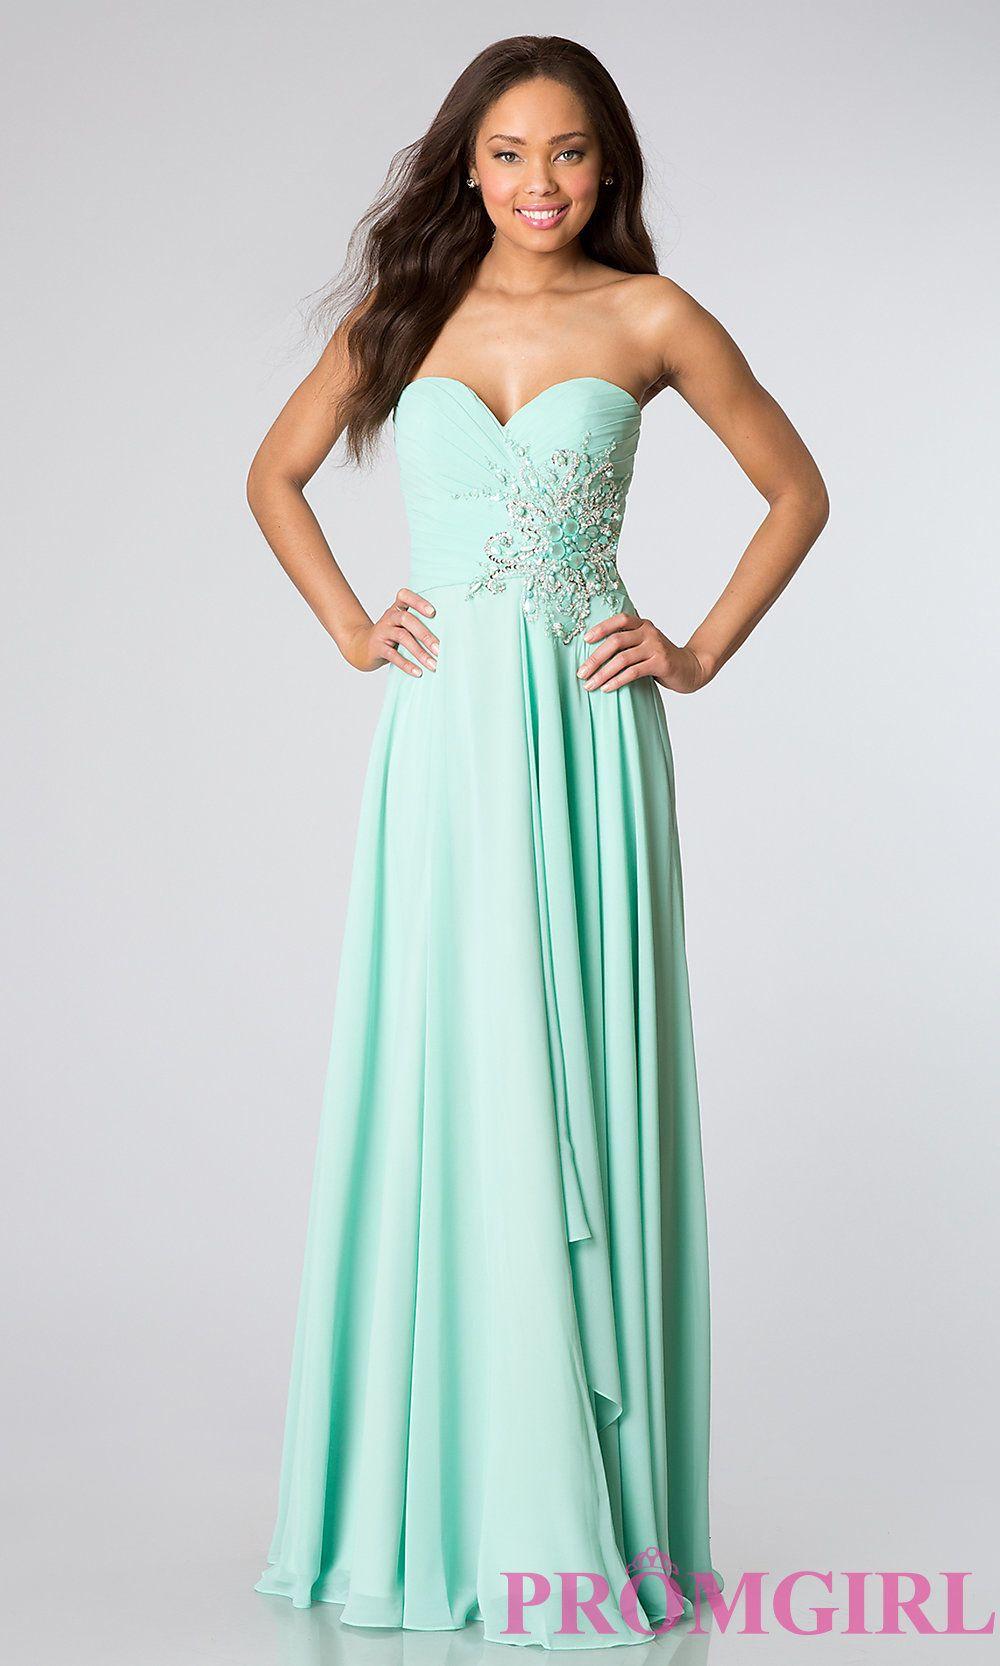 Long Prom Dress Style: JO-JVN-JVN88171 Front Image | 16 dresses ...